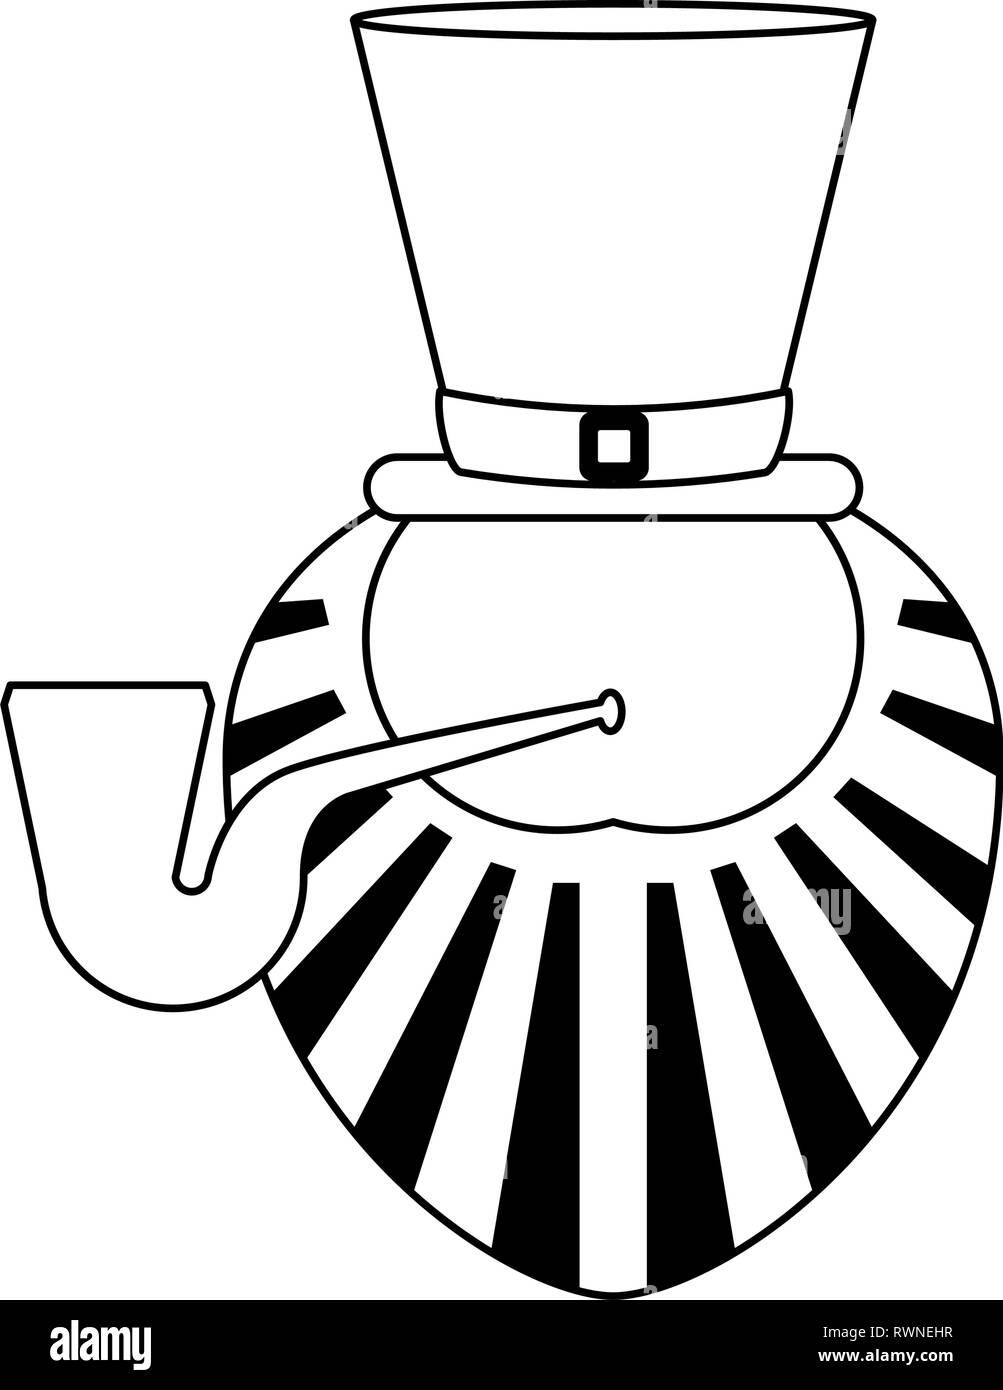 Saint patricks day cartoons black and white - Stock Image